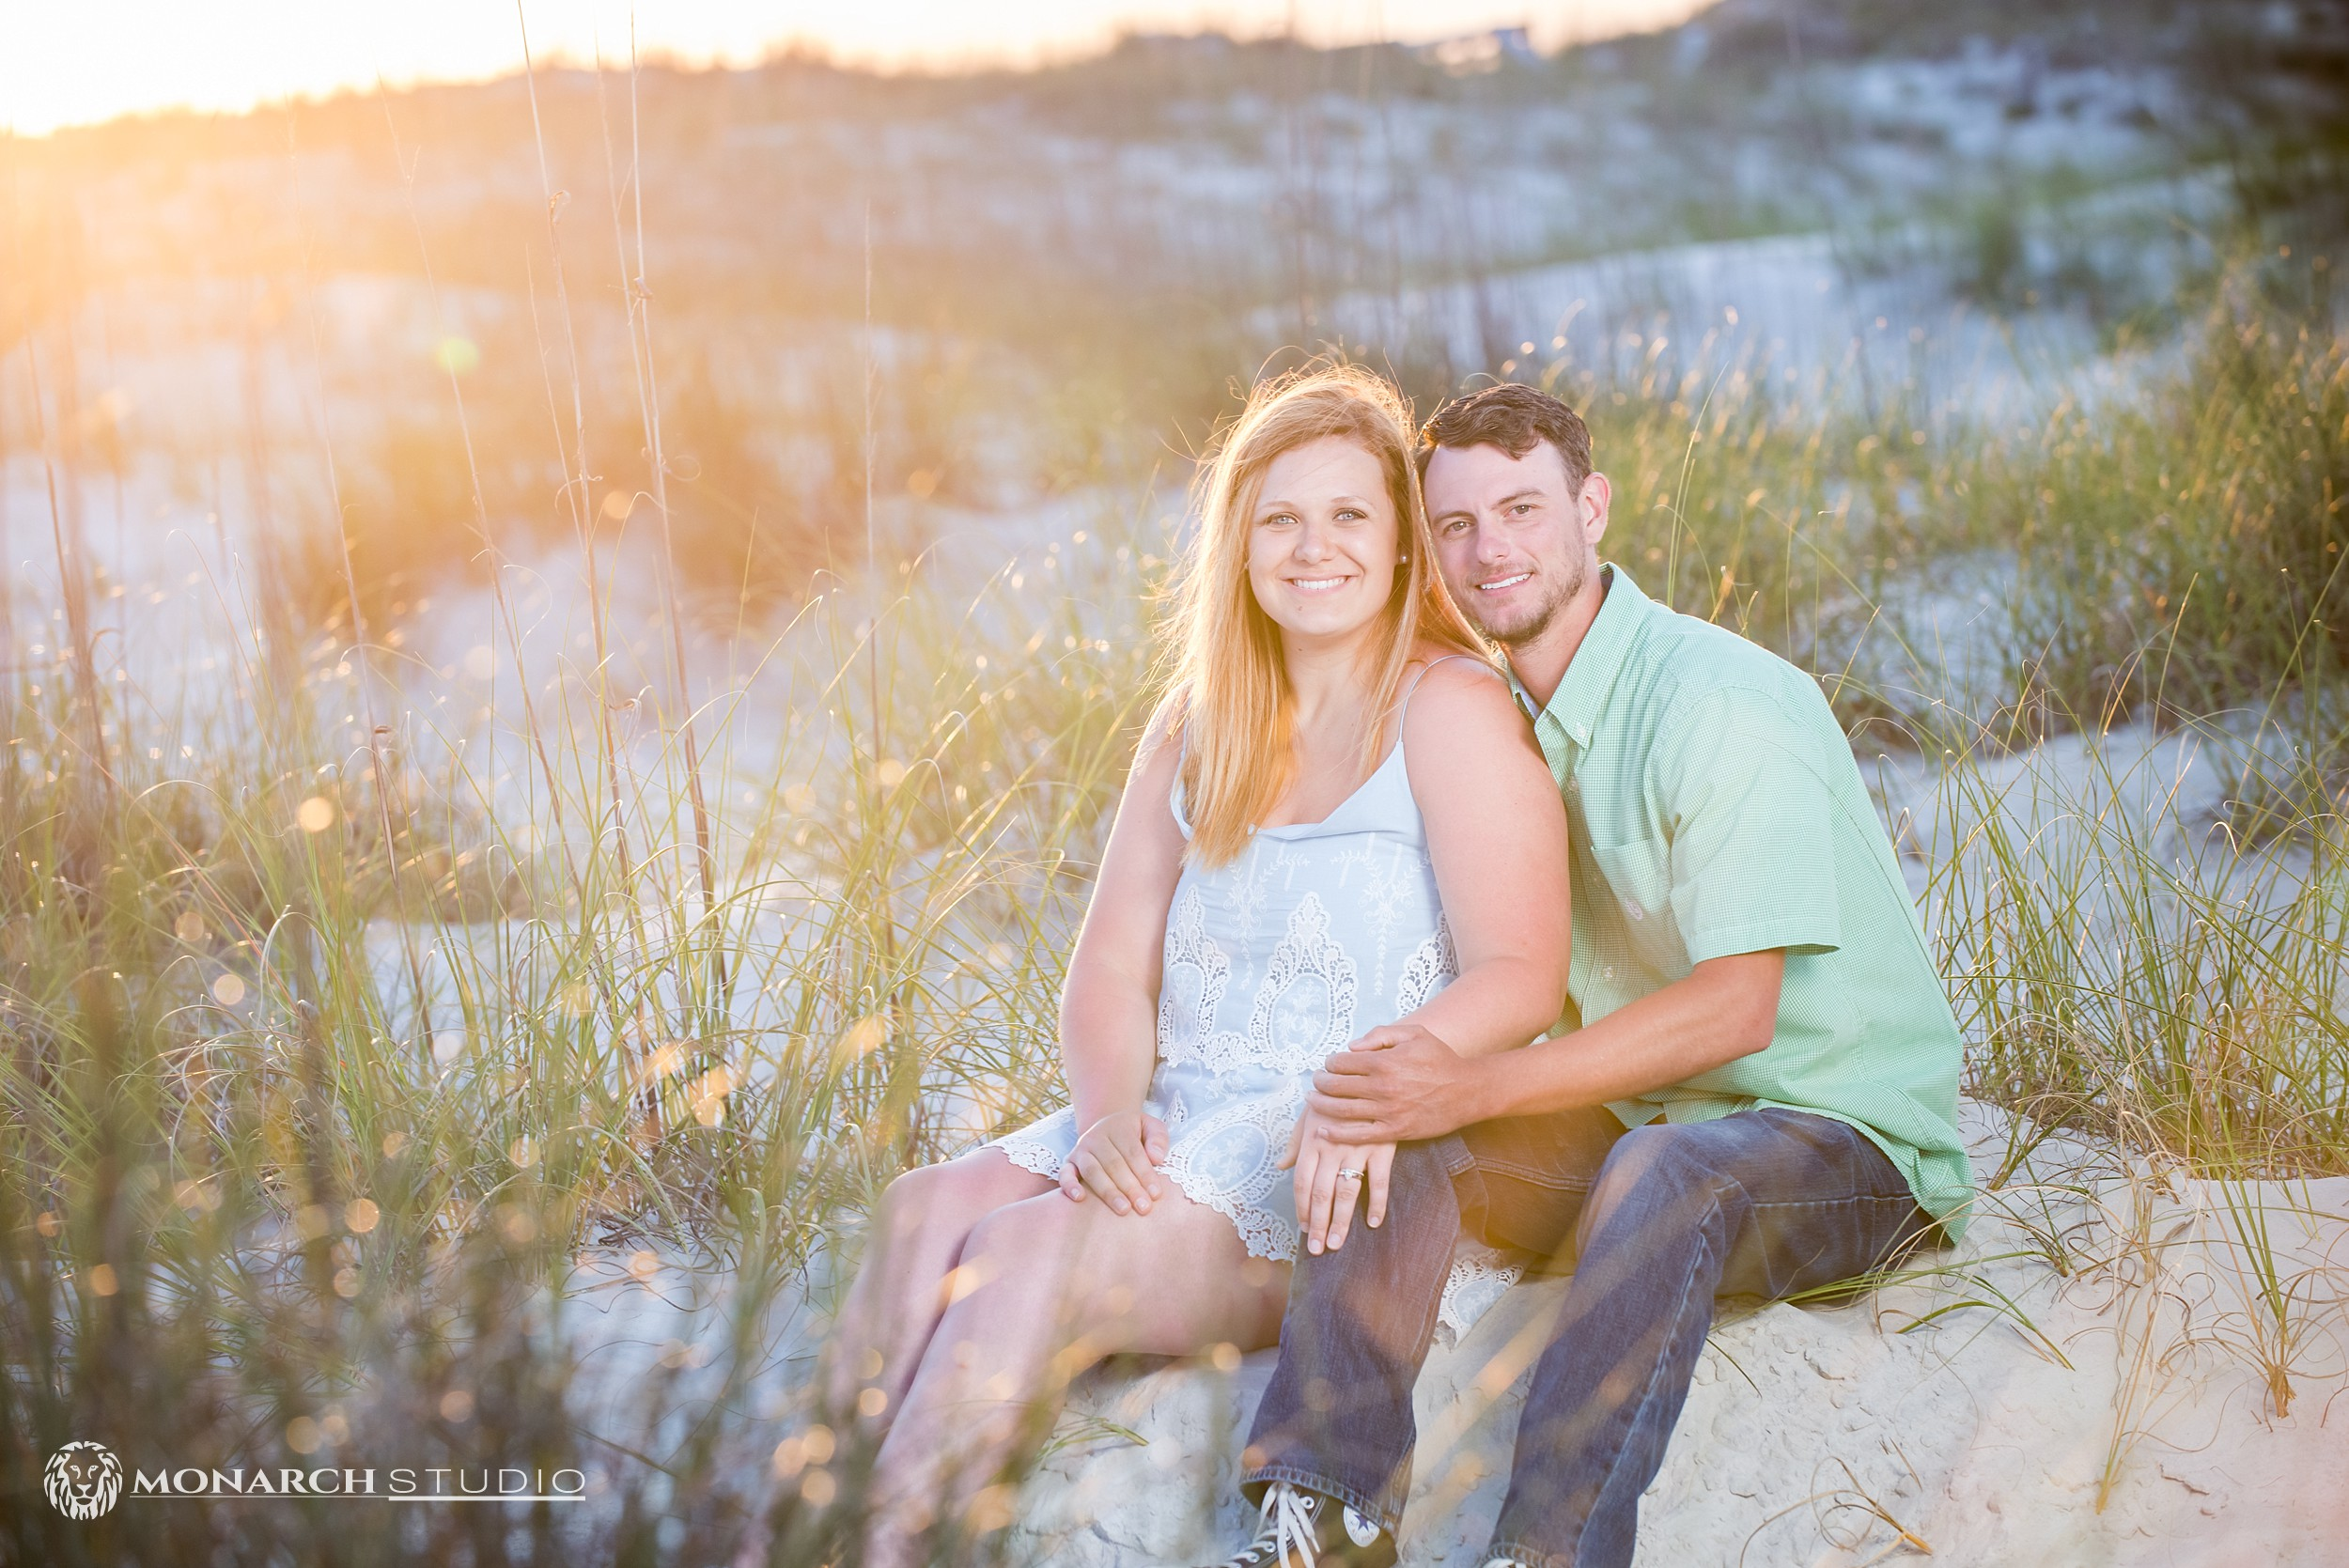 Family-Photographer-St-Augustine-Beach-Florida_0013.jpg